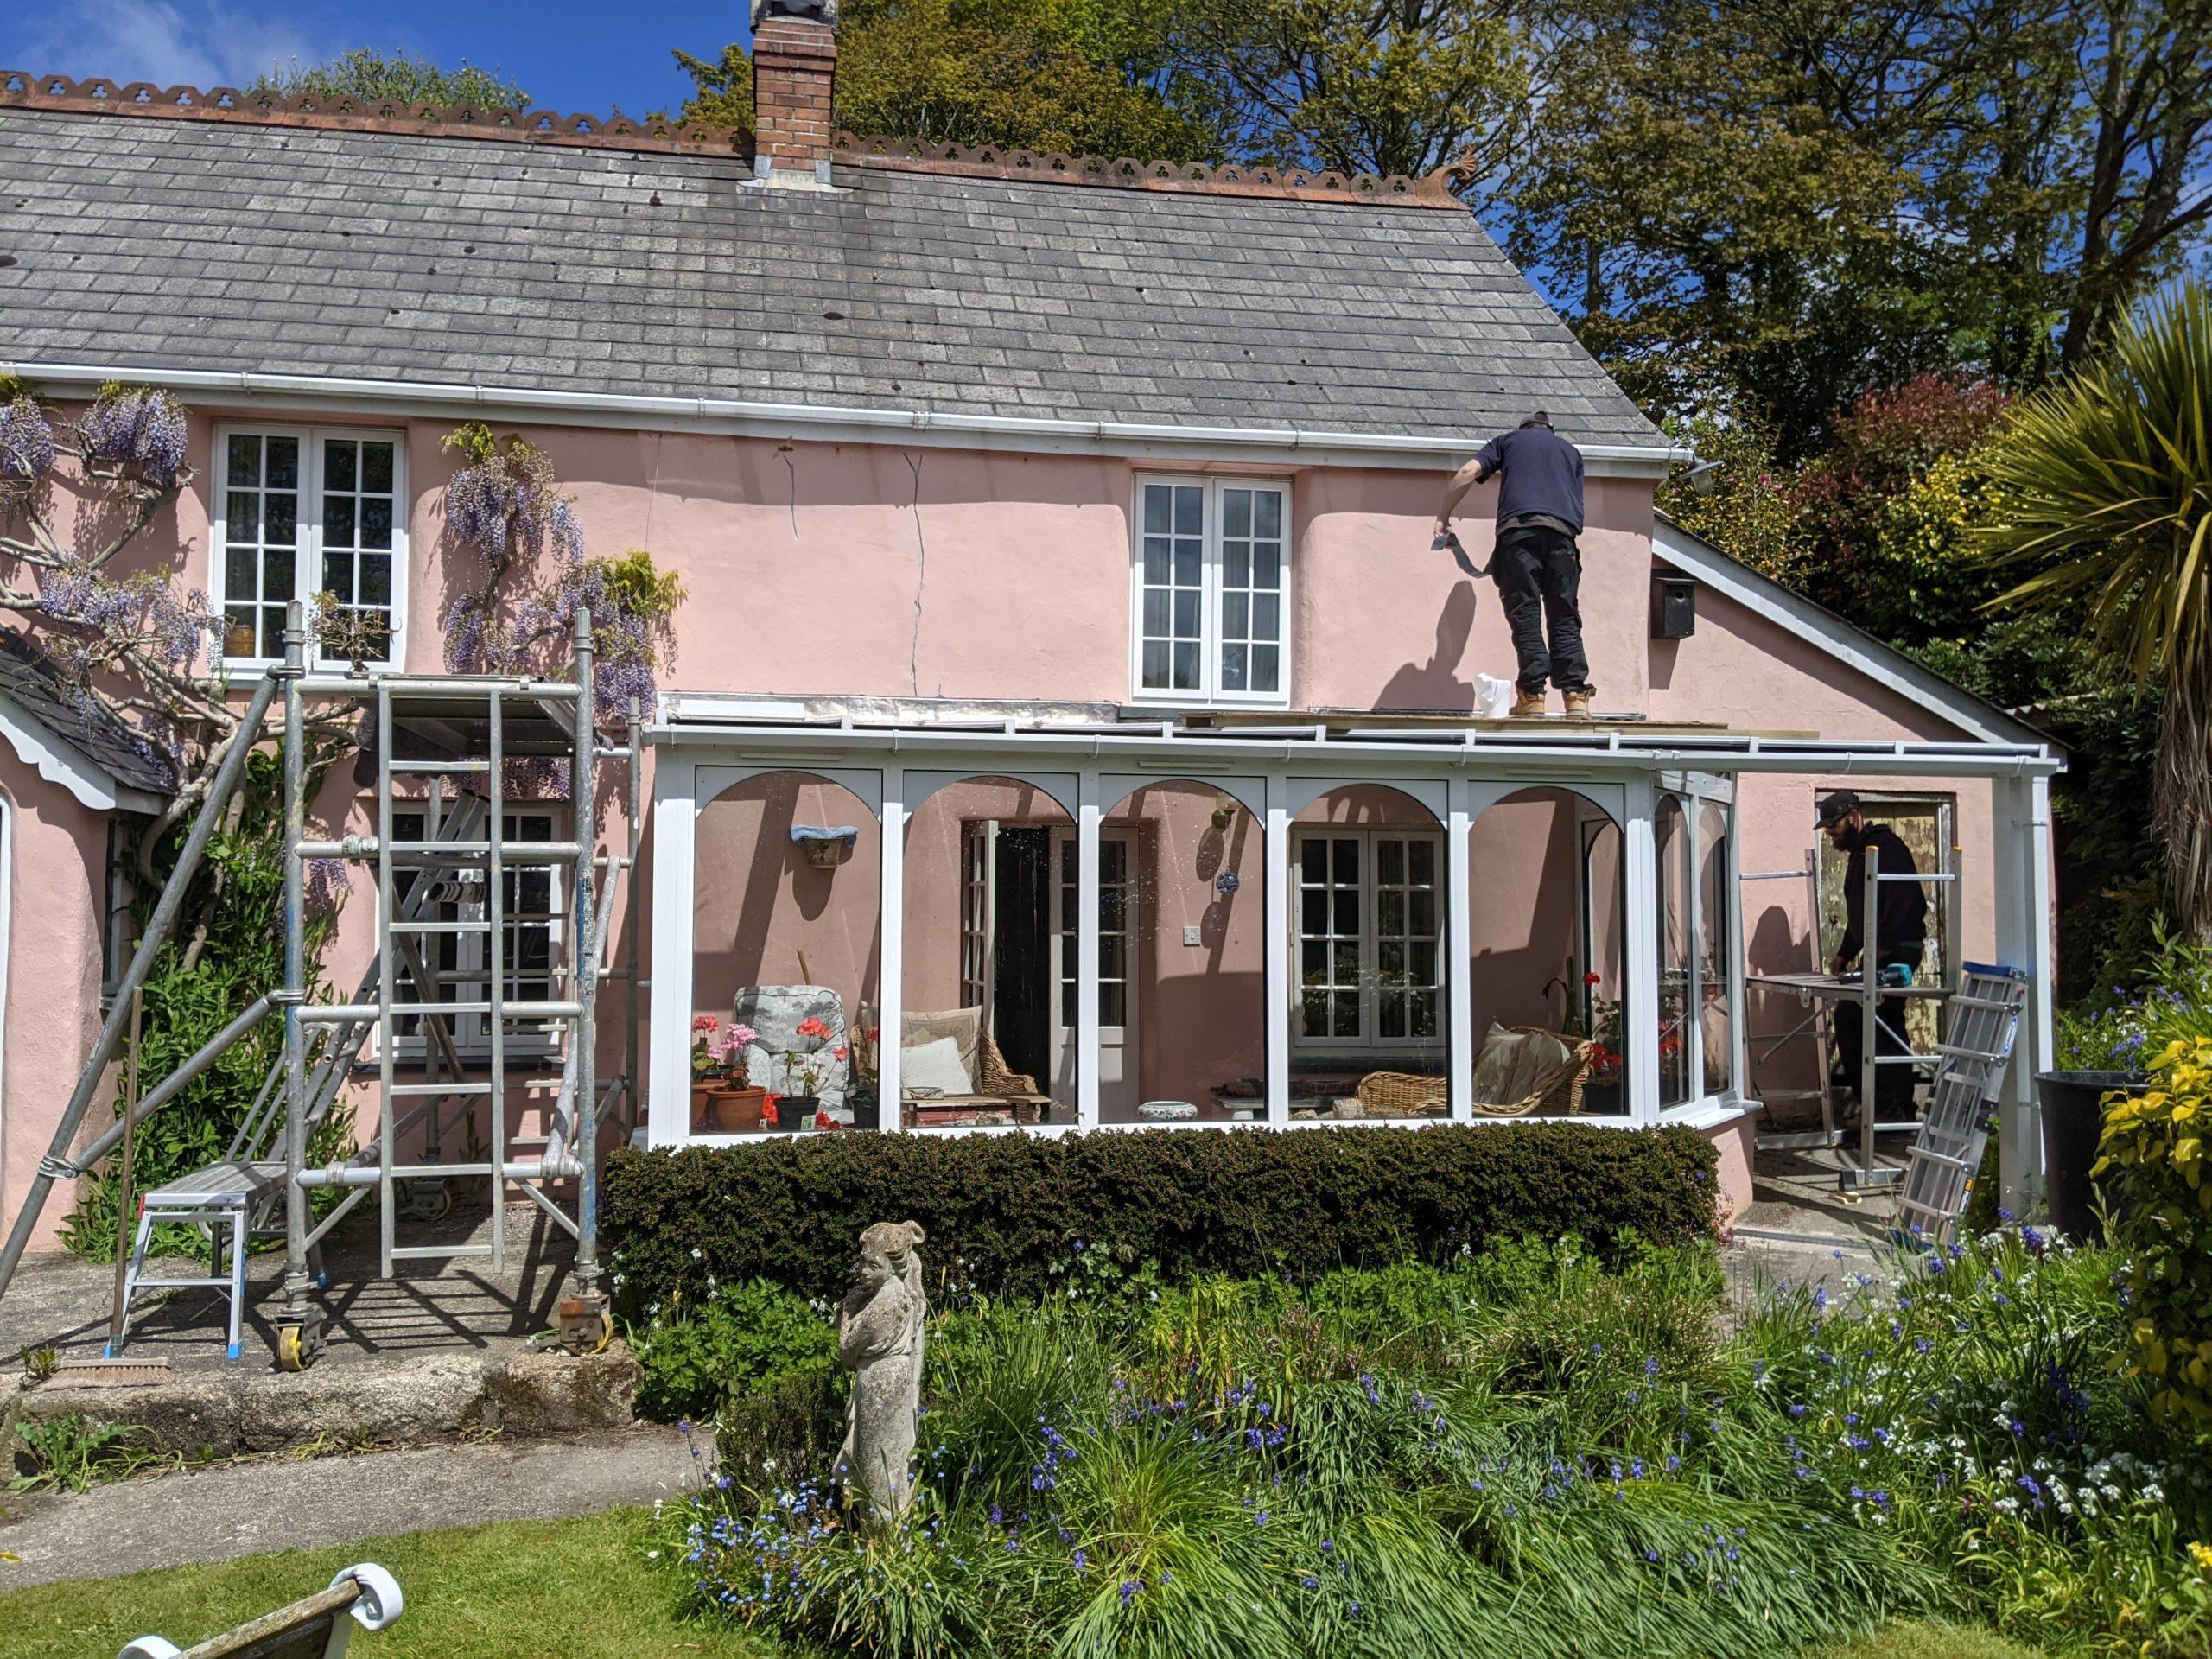 Conservatory repairs in Blackwater